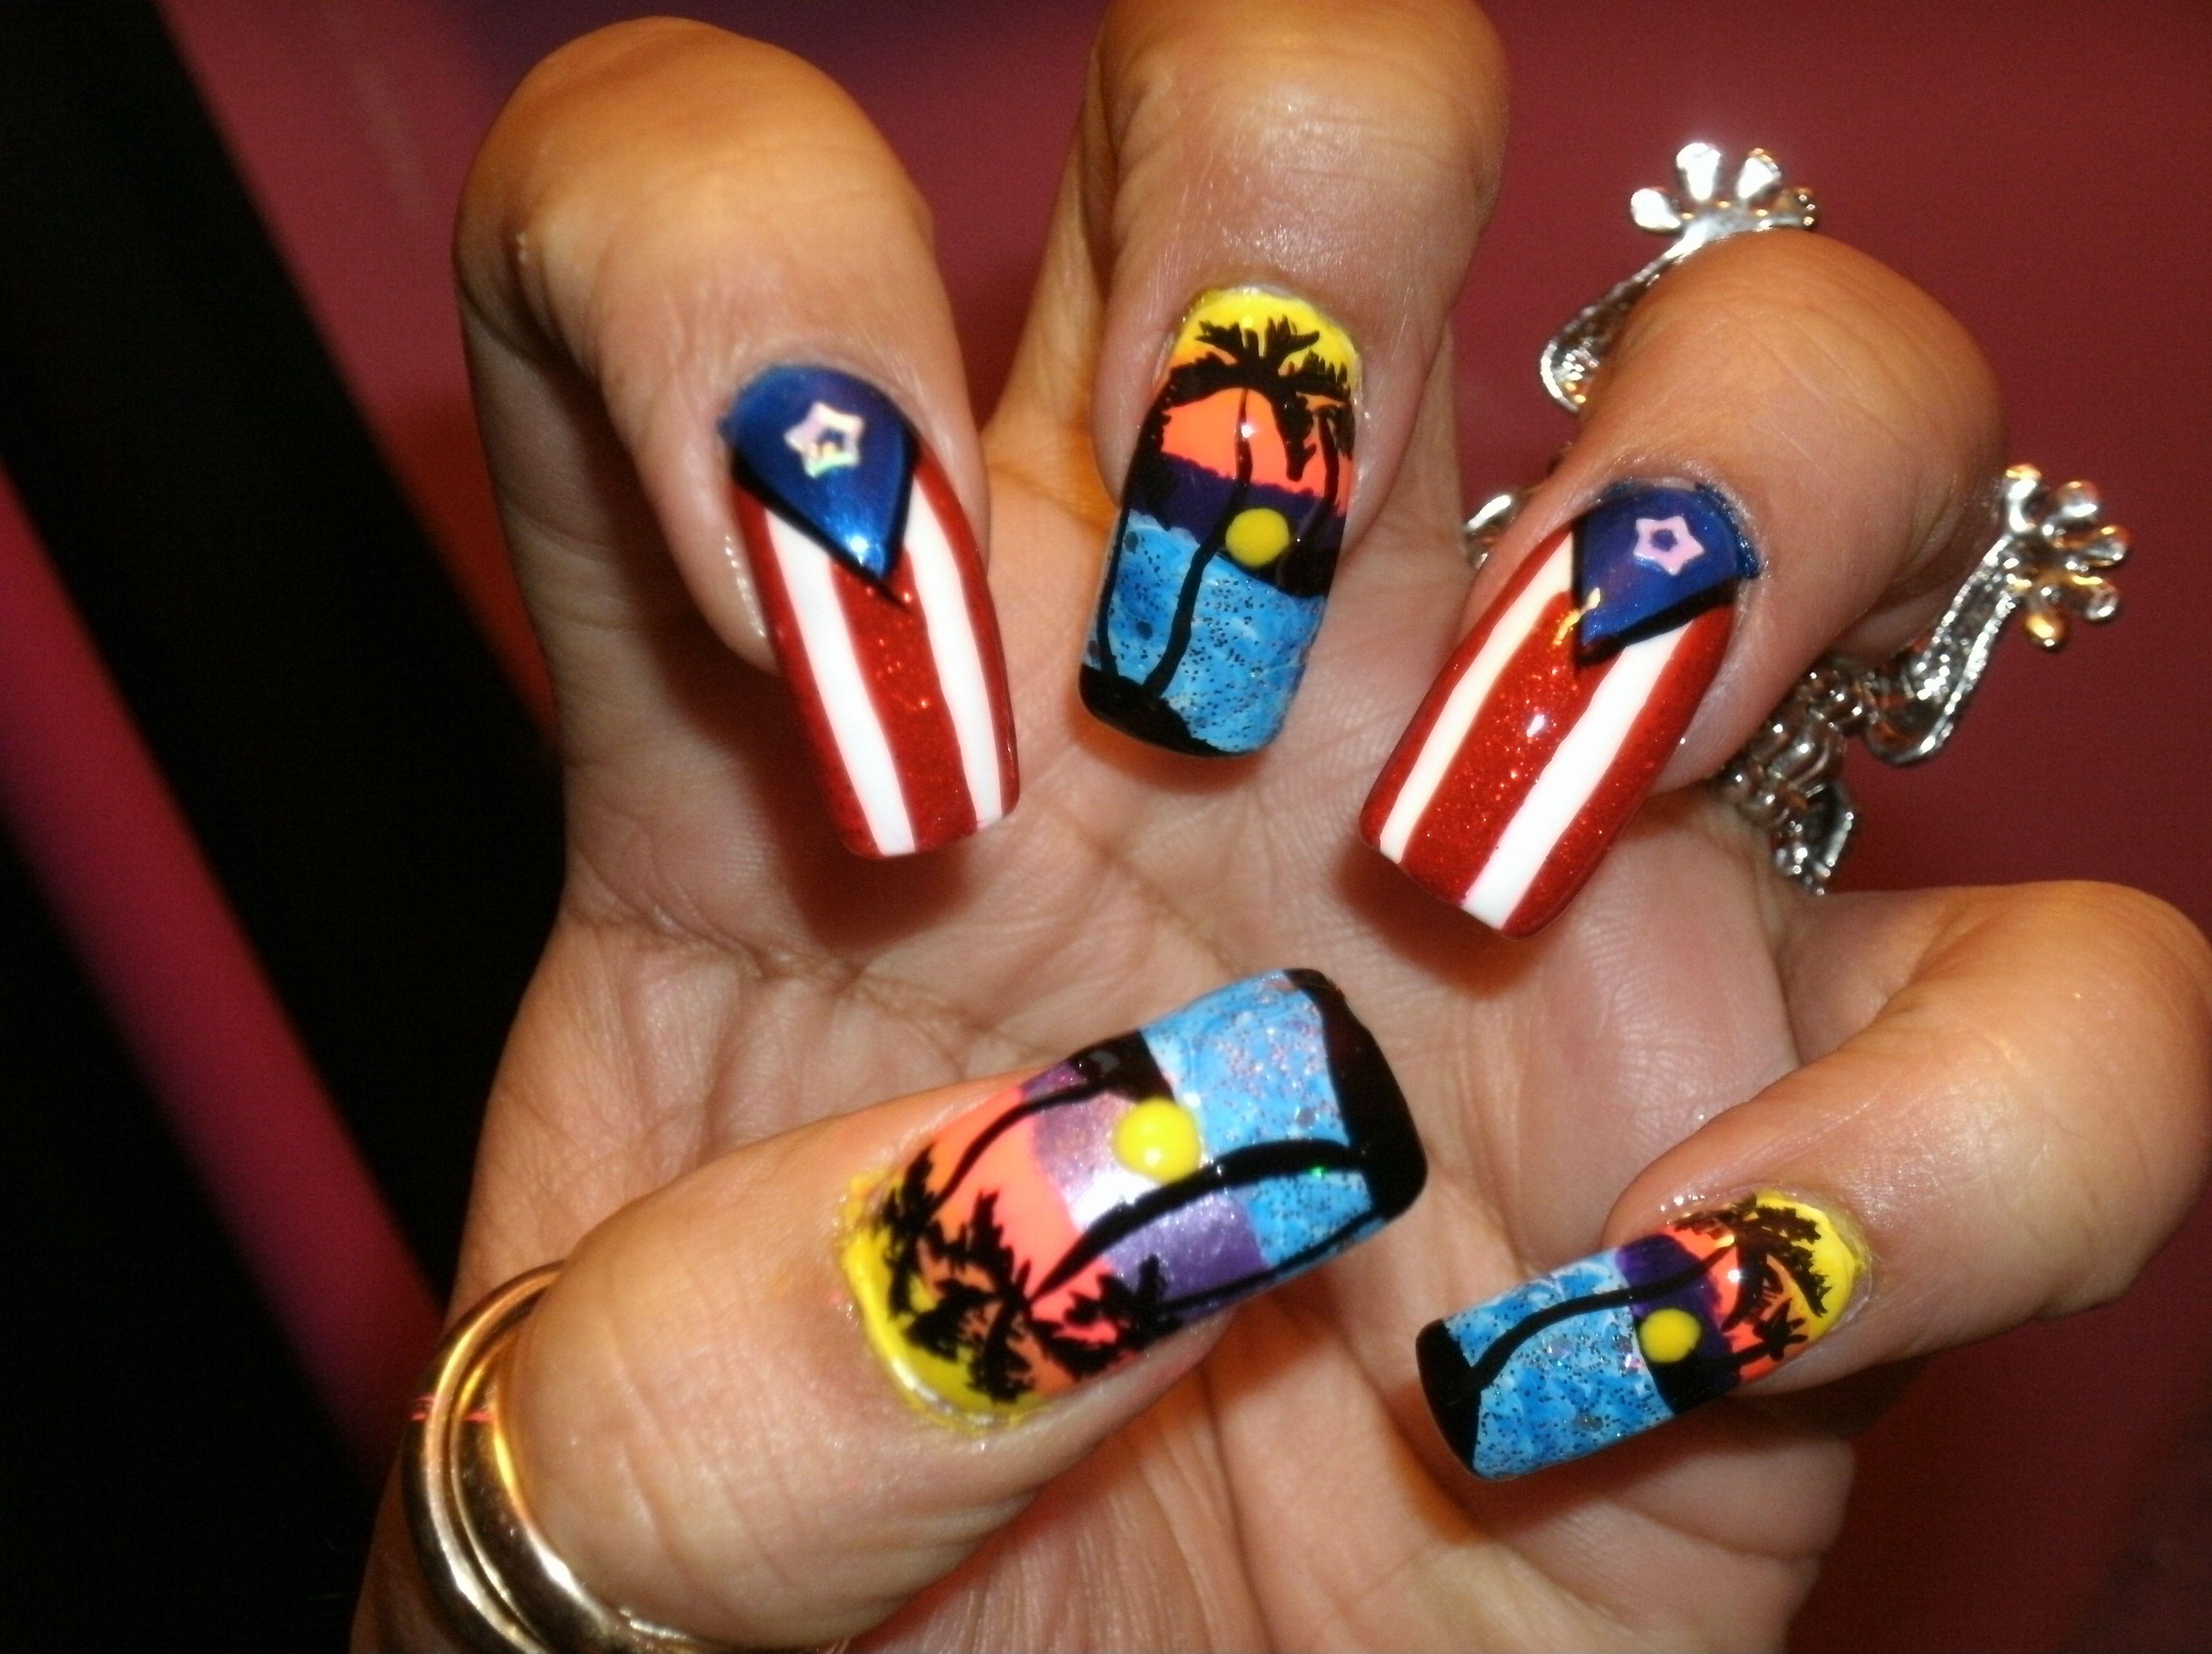 Boricua Nail Art Design My Nail Art Designs 3 Pinterest